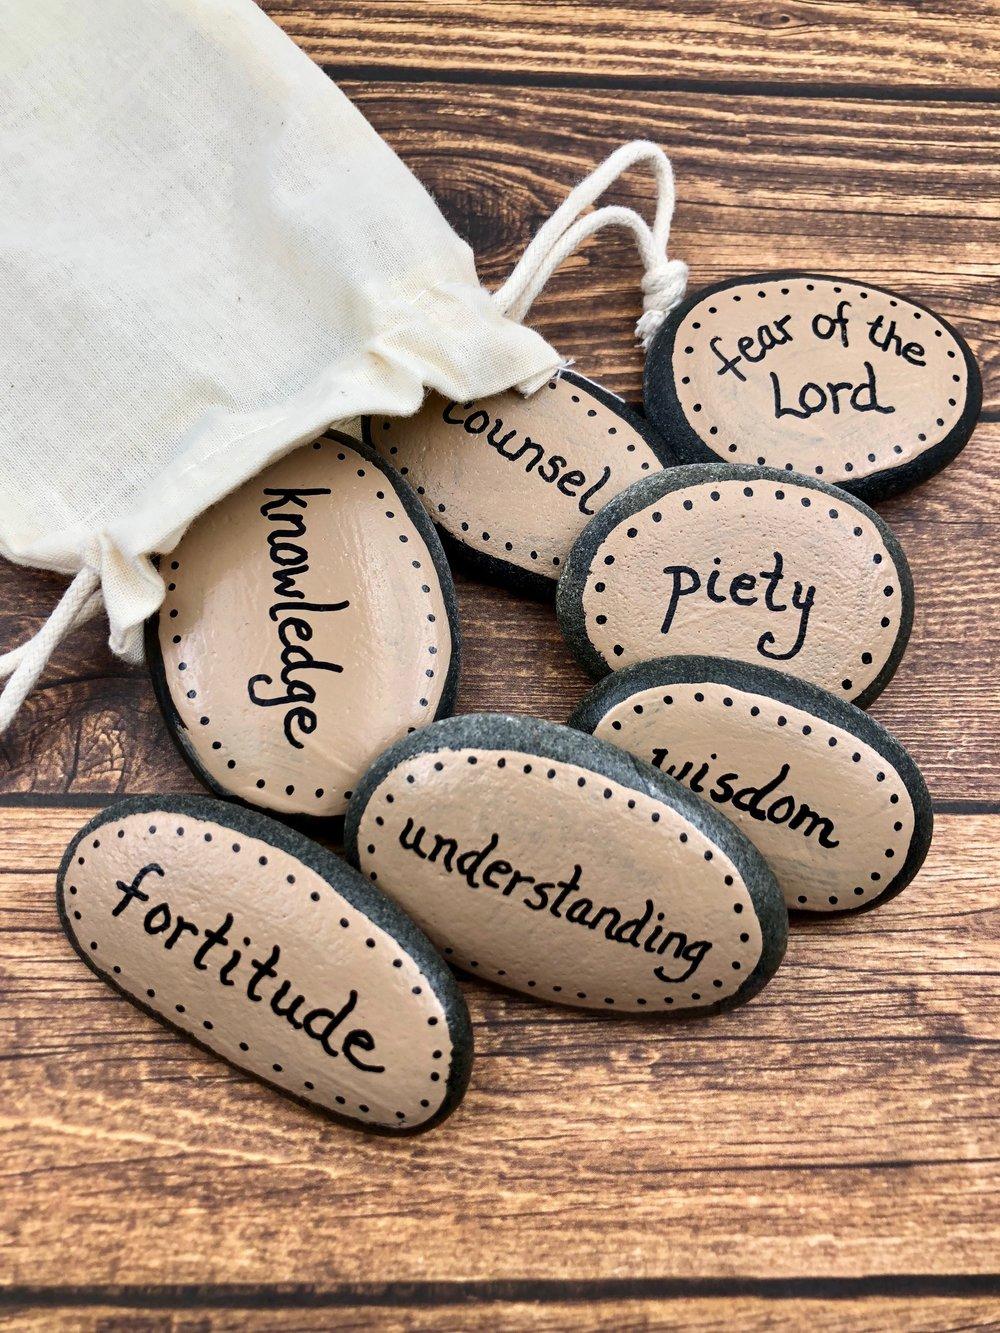 Seven Gifts of the Holy Spirit Confirmation Gift, Set of 7 Catholic Holy Spirit Stones